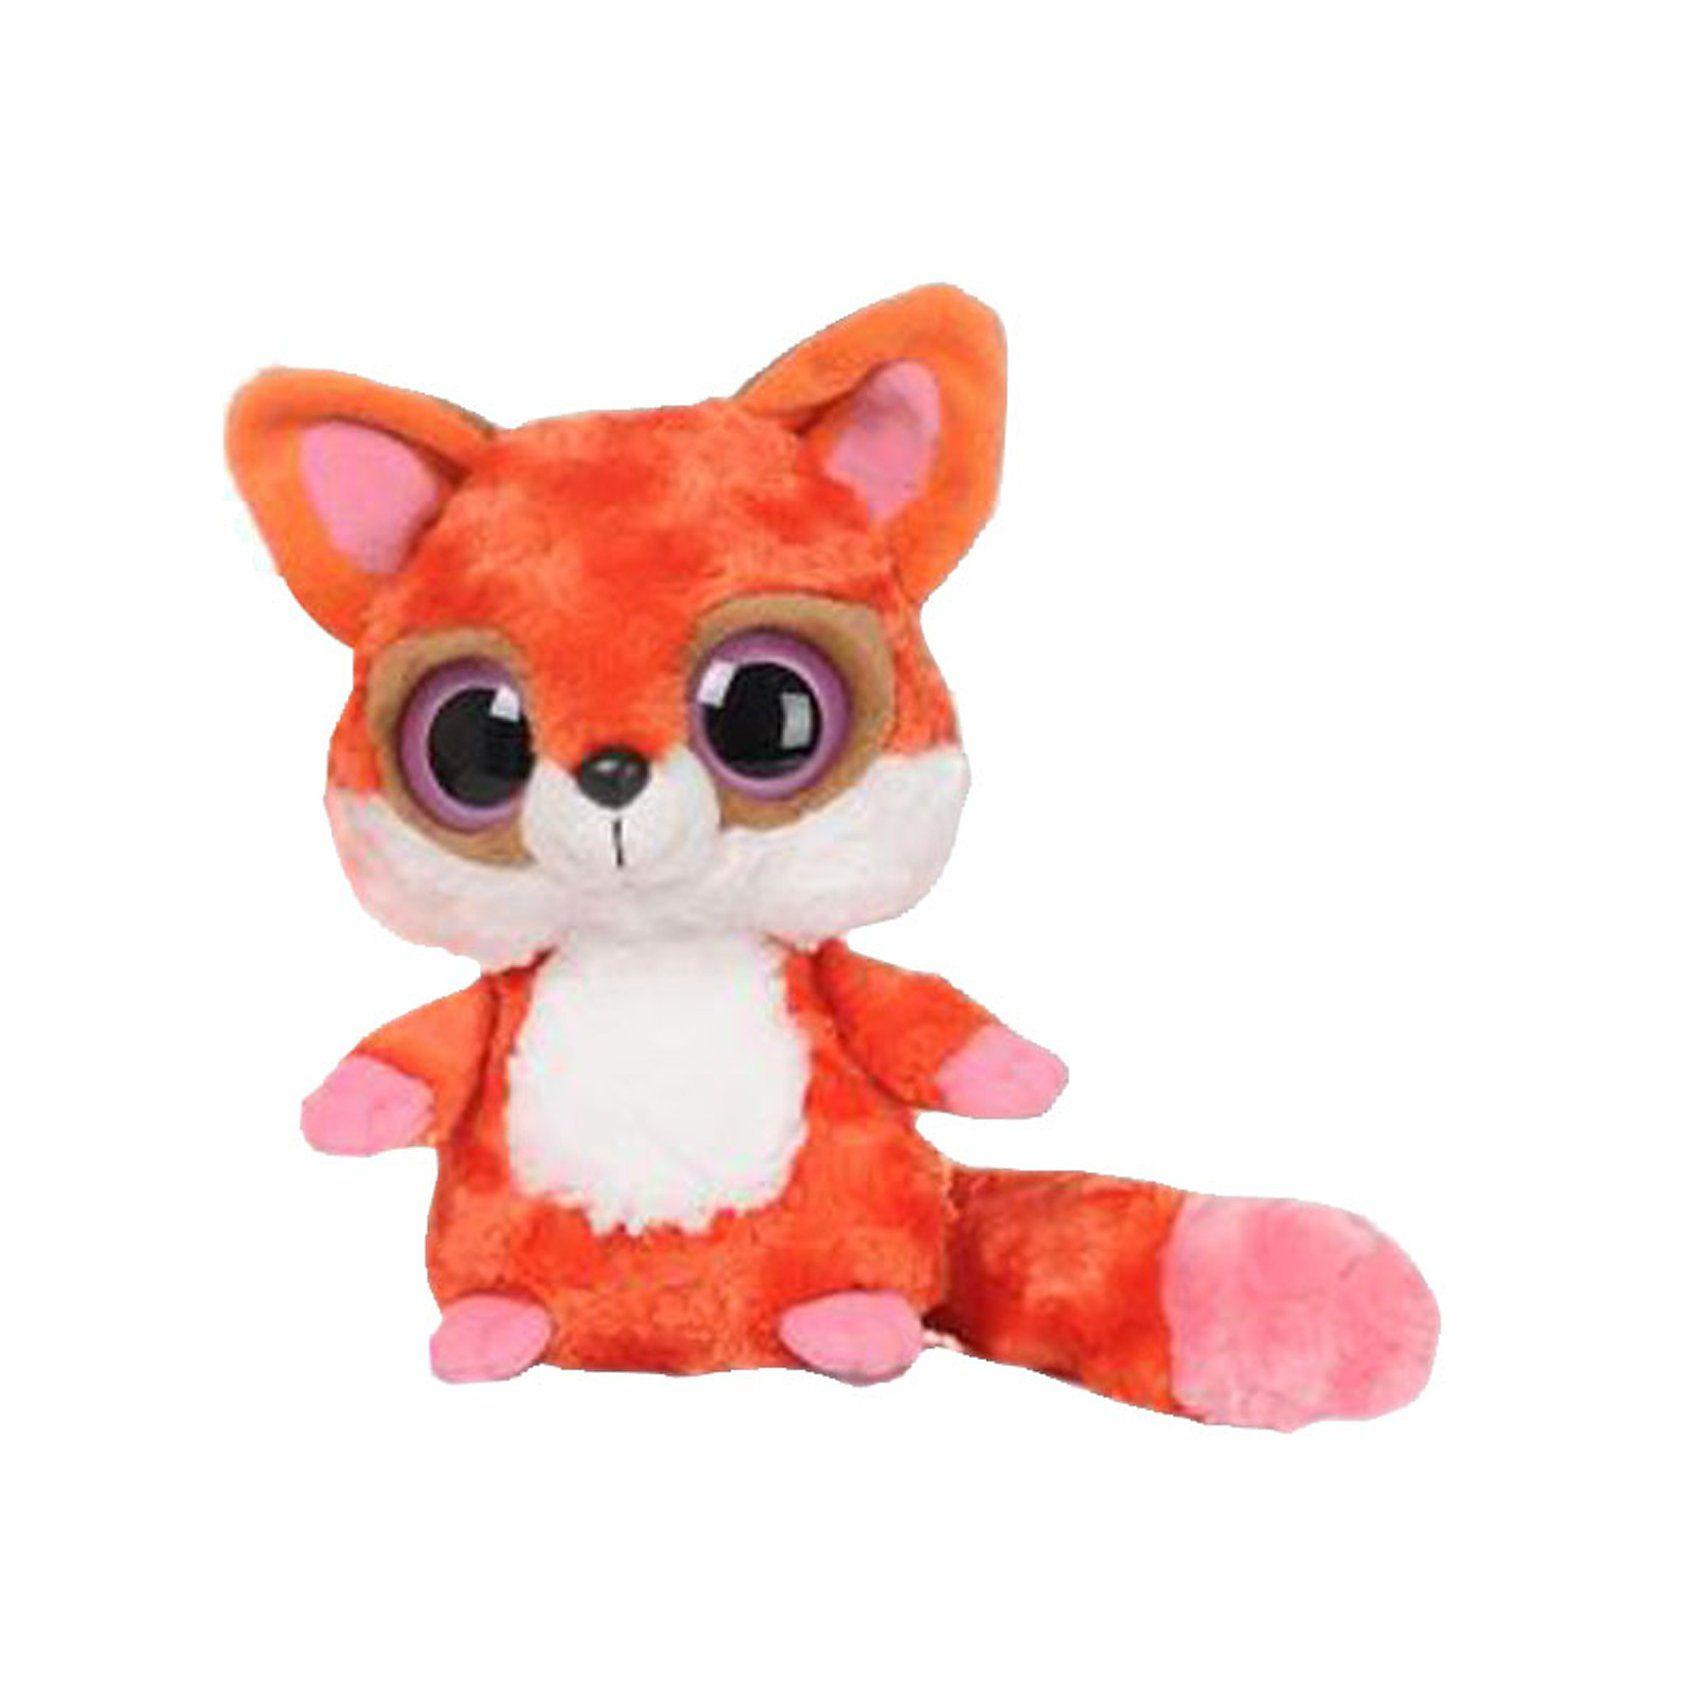 YooHoo & Friends Fuchs 18 cm